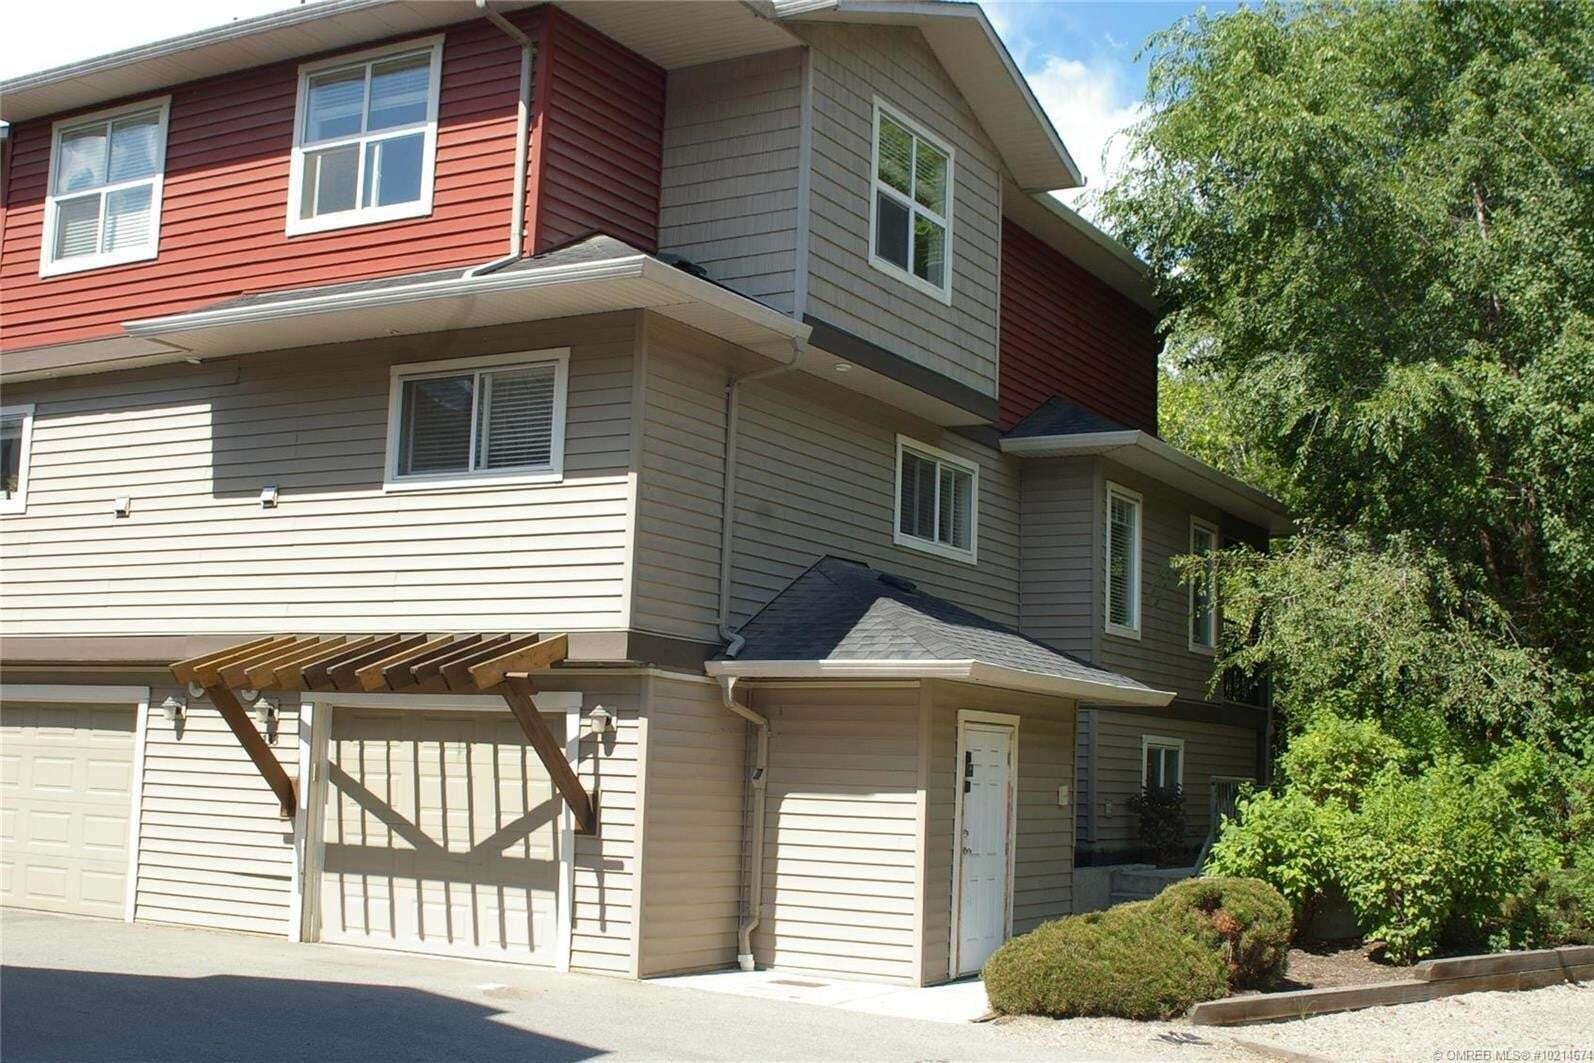 Townhouse for sale at 1355 Findlay Rd Kelowna British Columbia - MLS: 10214674